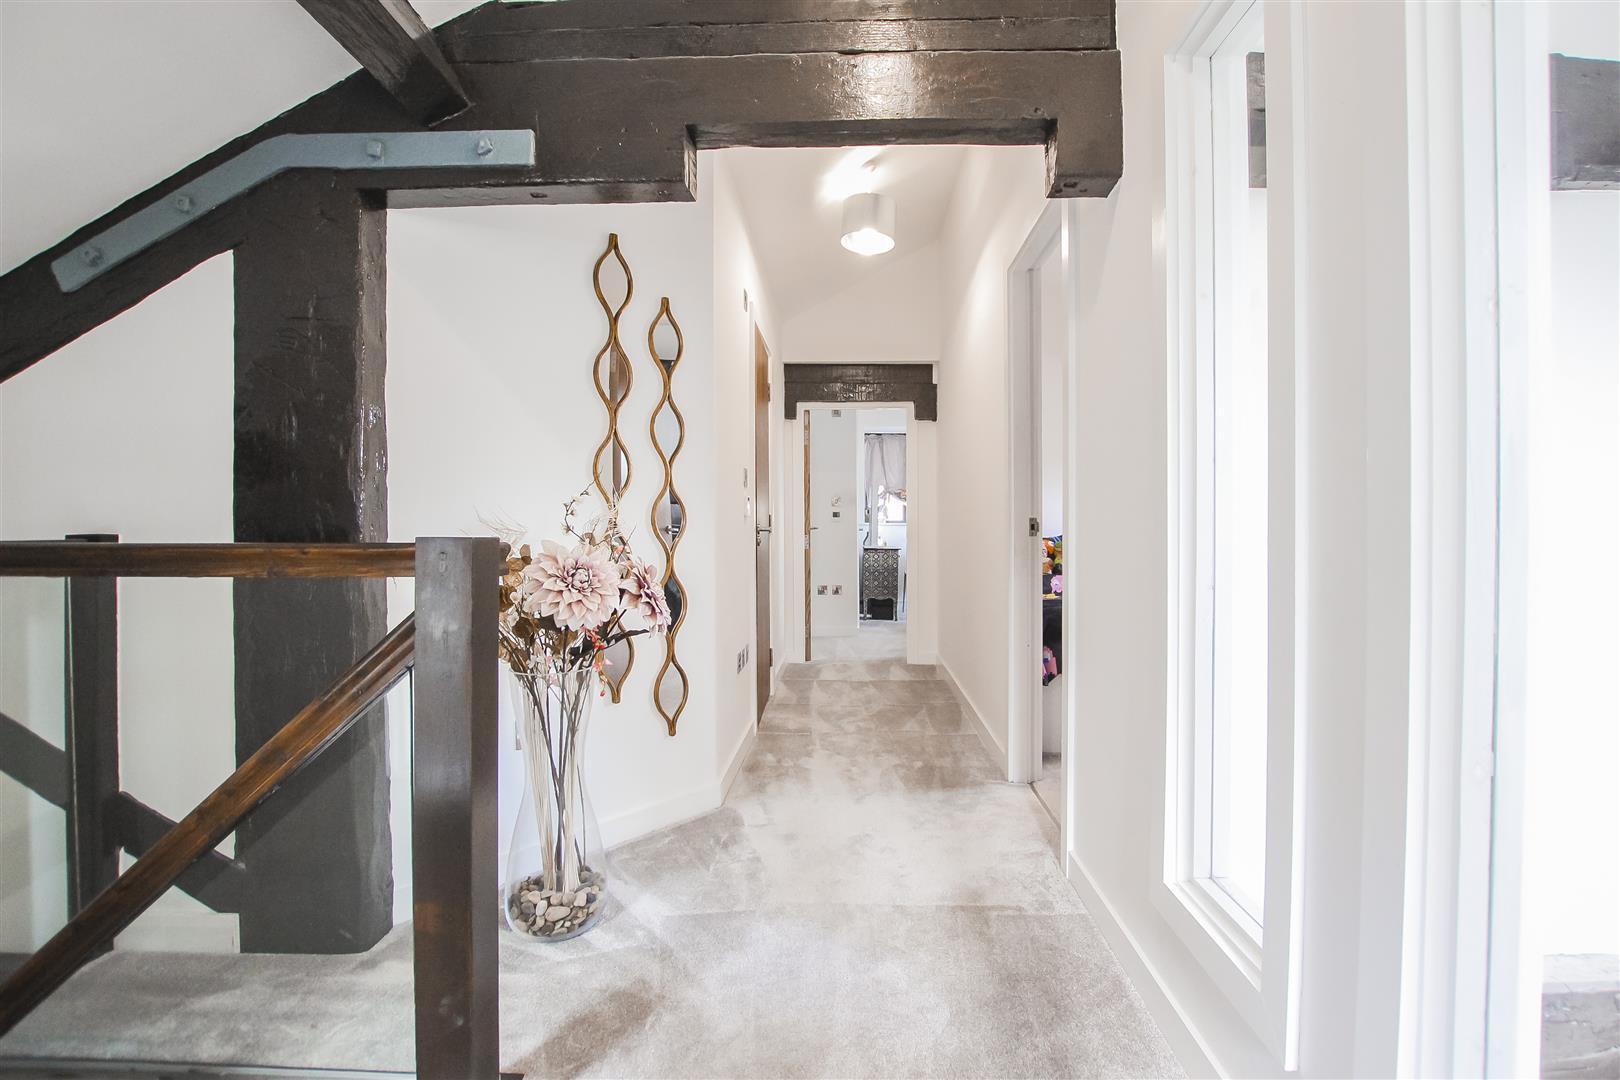 3 Bedroom Duplex Apartment For Sale - Image 6